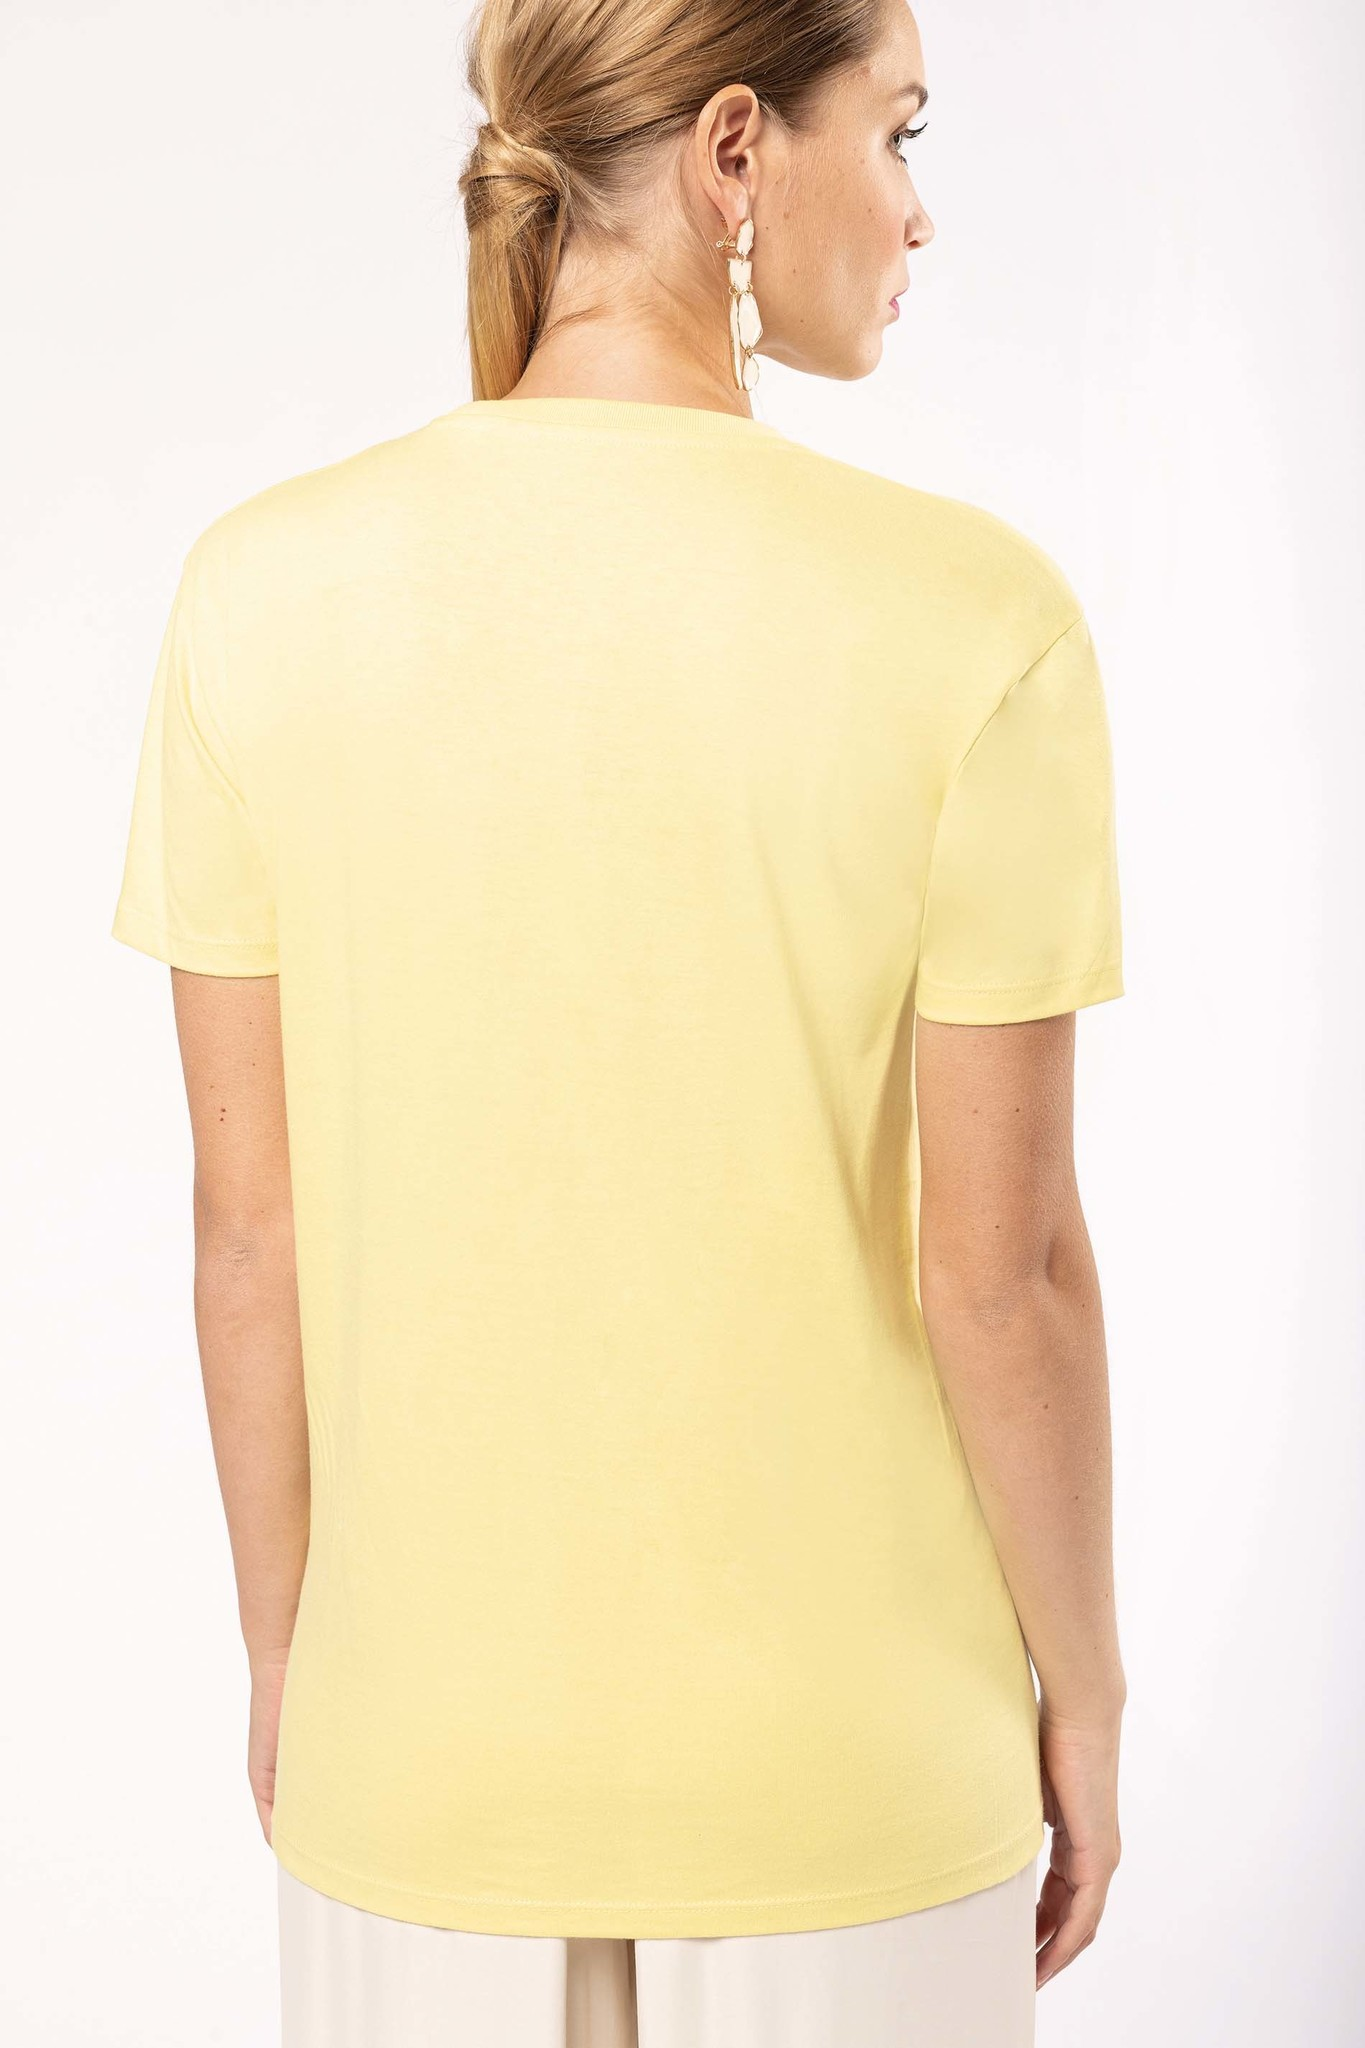 Eco-Friendly Unisex T-shirt - Ice-Mint